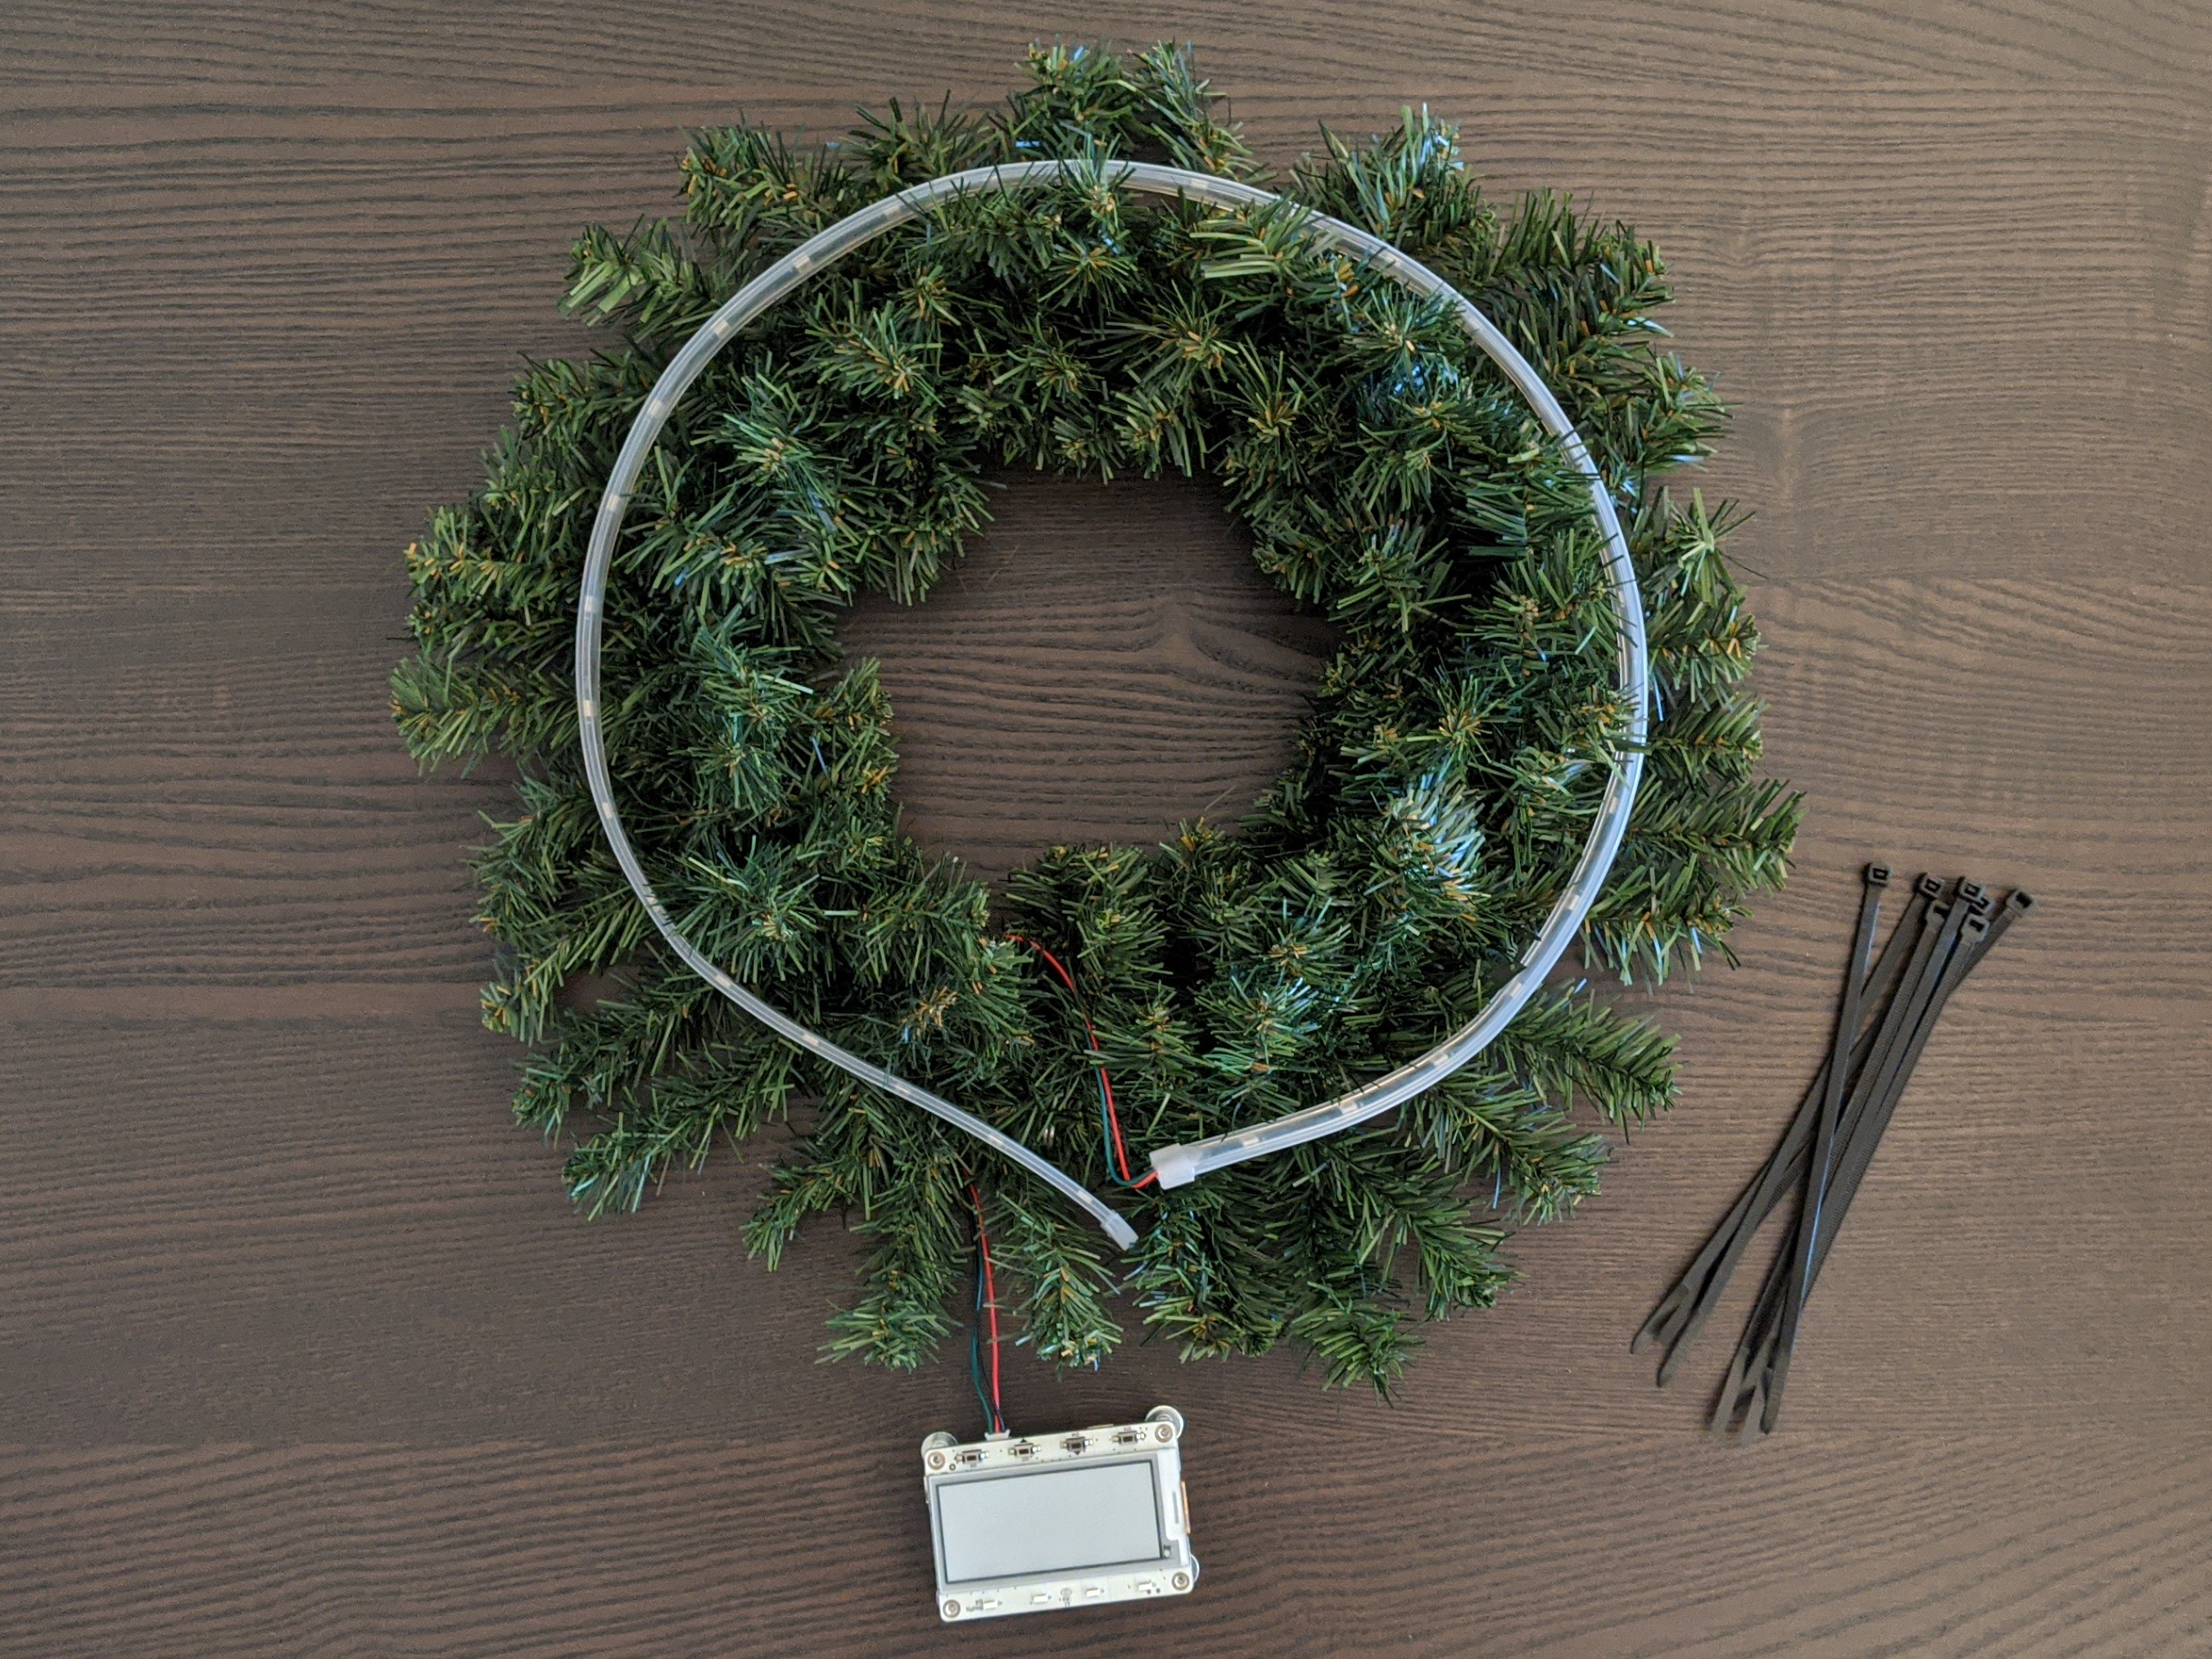 led_strips_MagTag_LED_strip_on_wreath.jpg